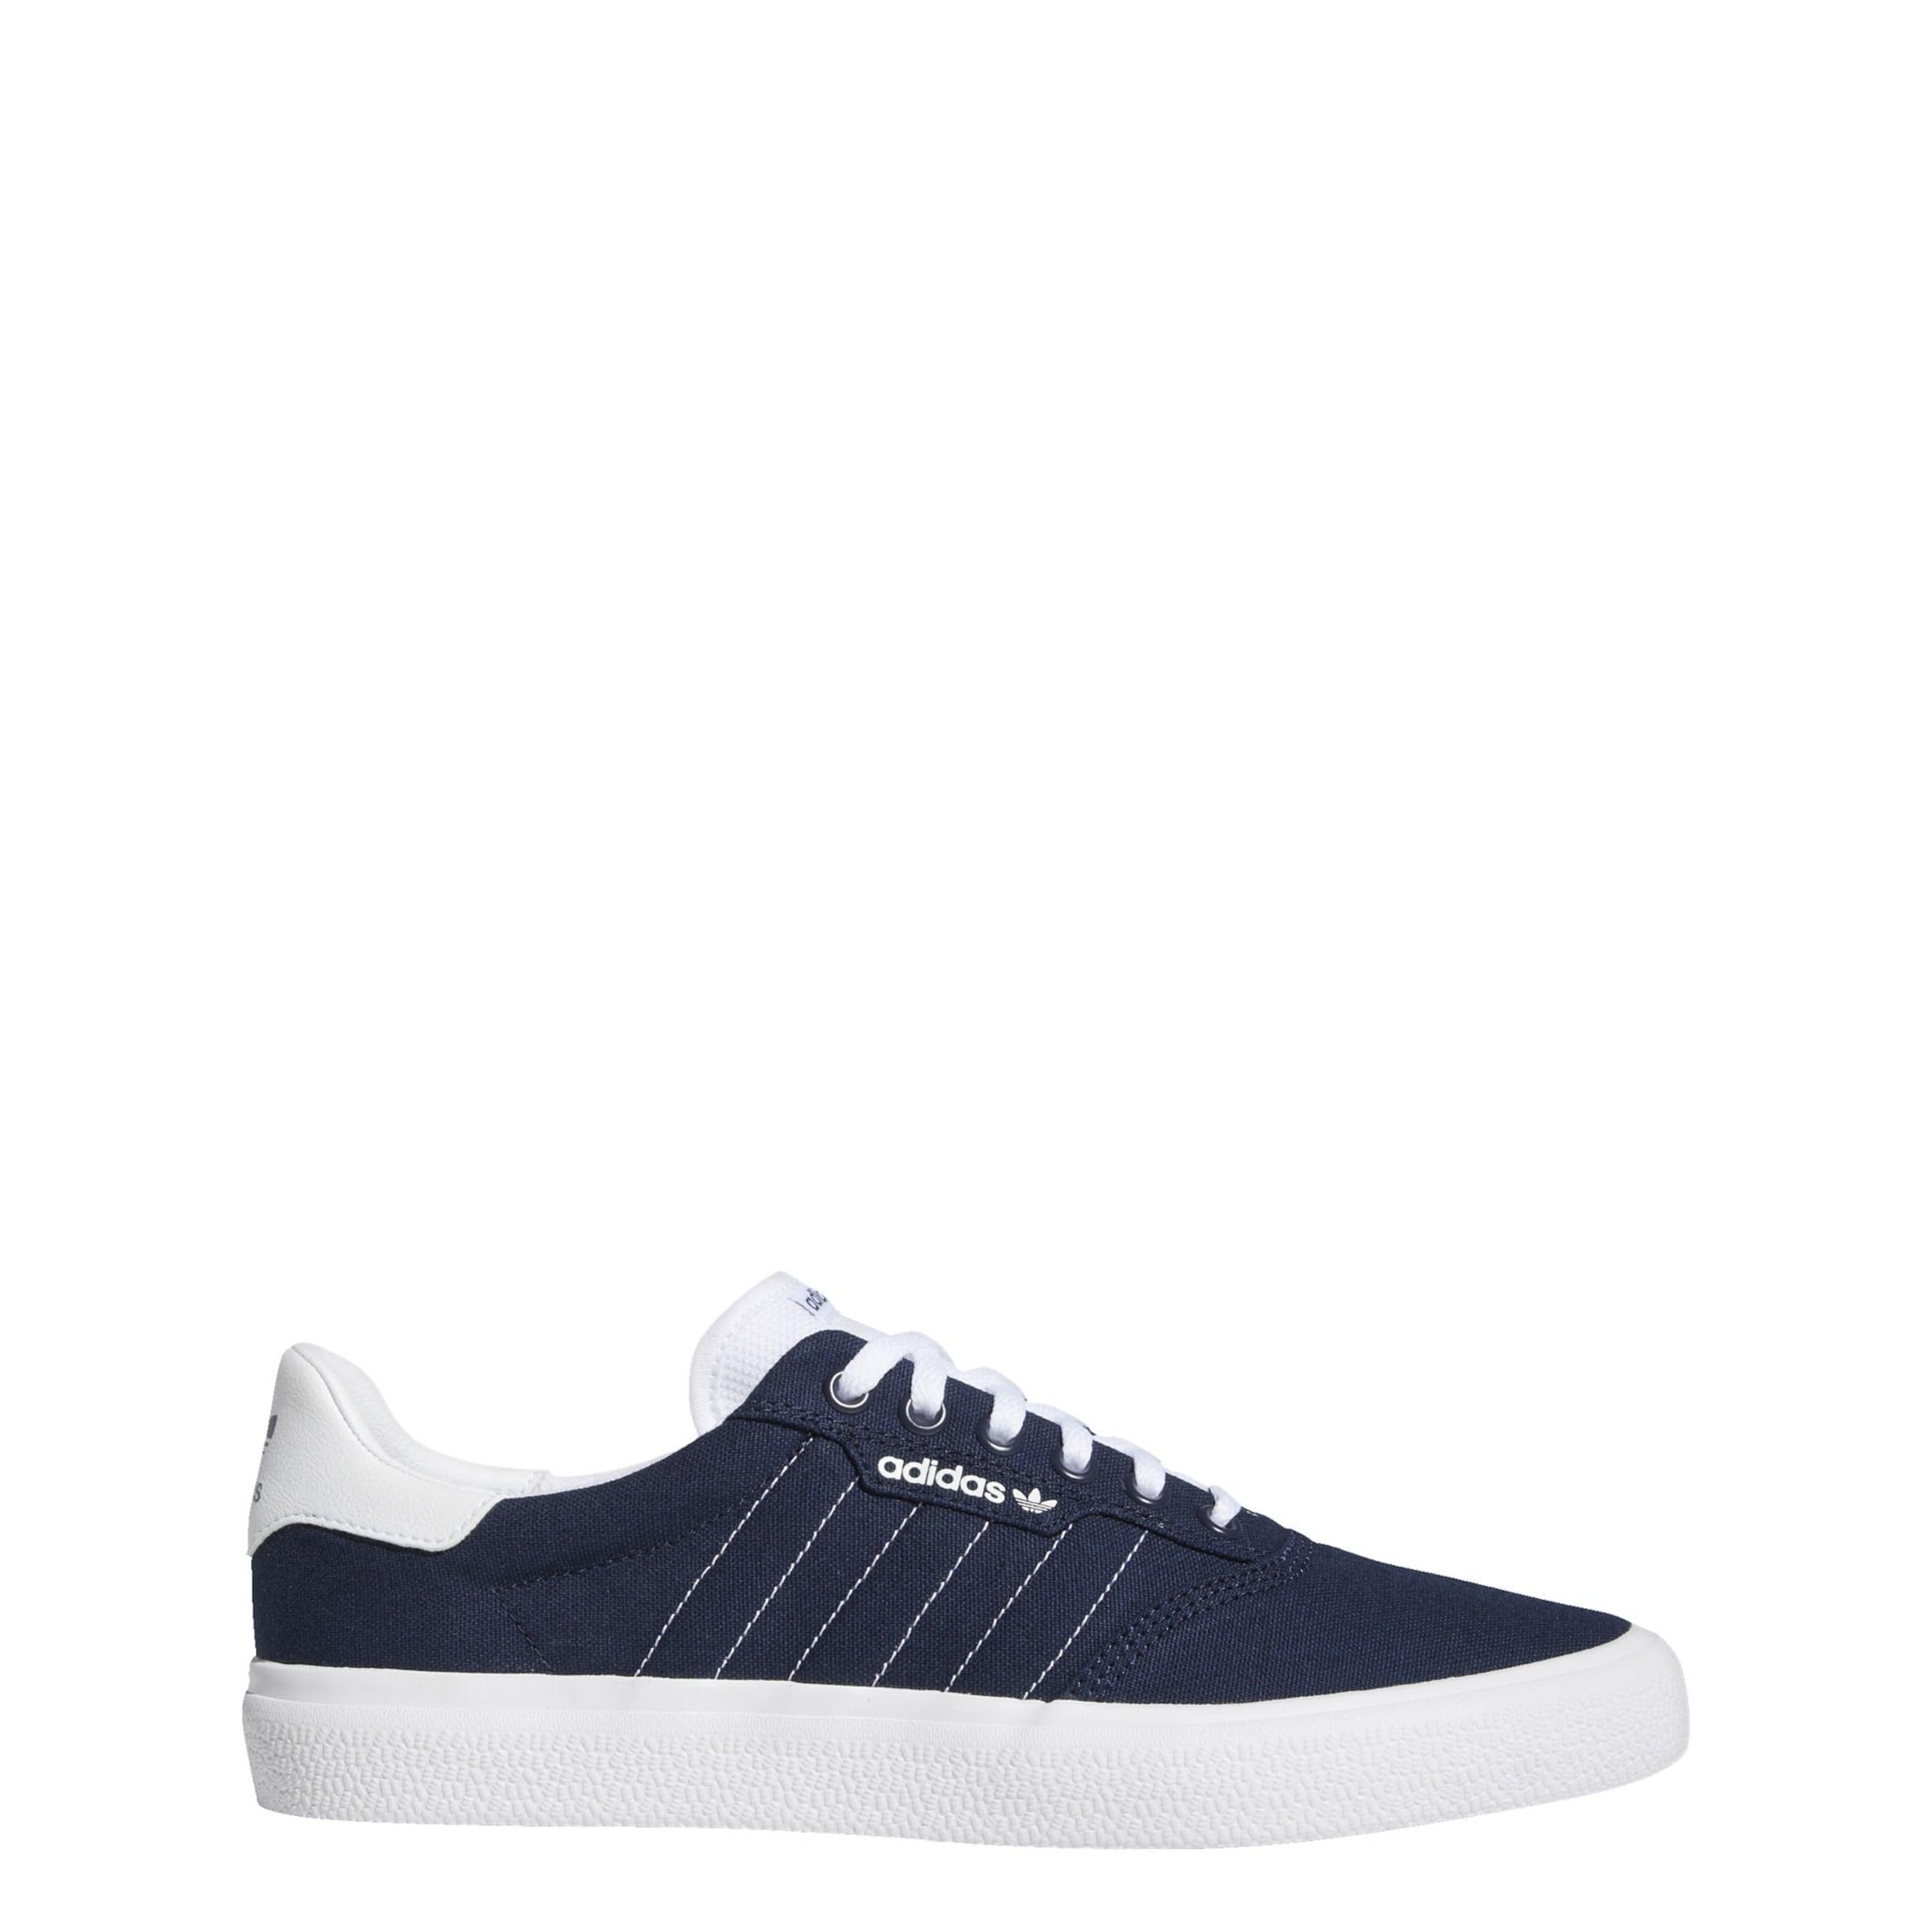 NavyWeiß Originals Adidas Schuhe In '3mc' qzMpUVS